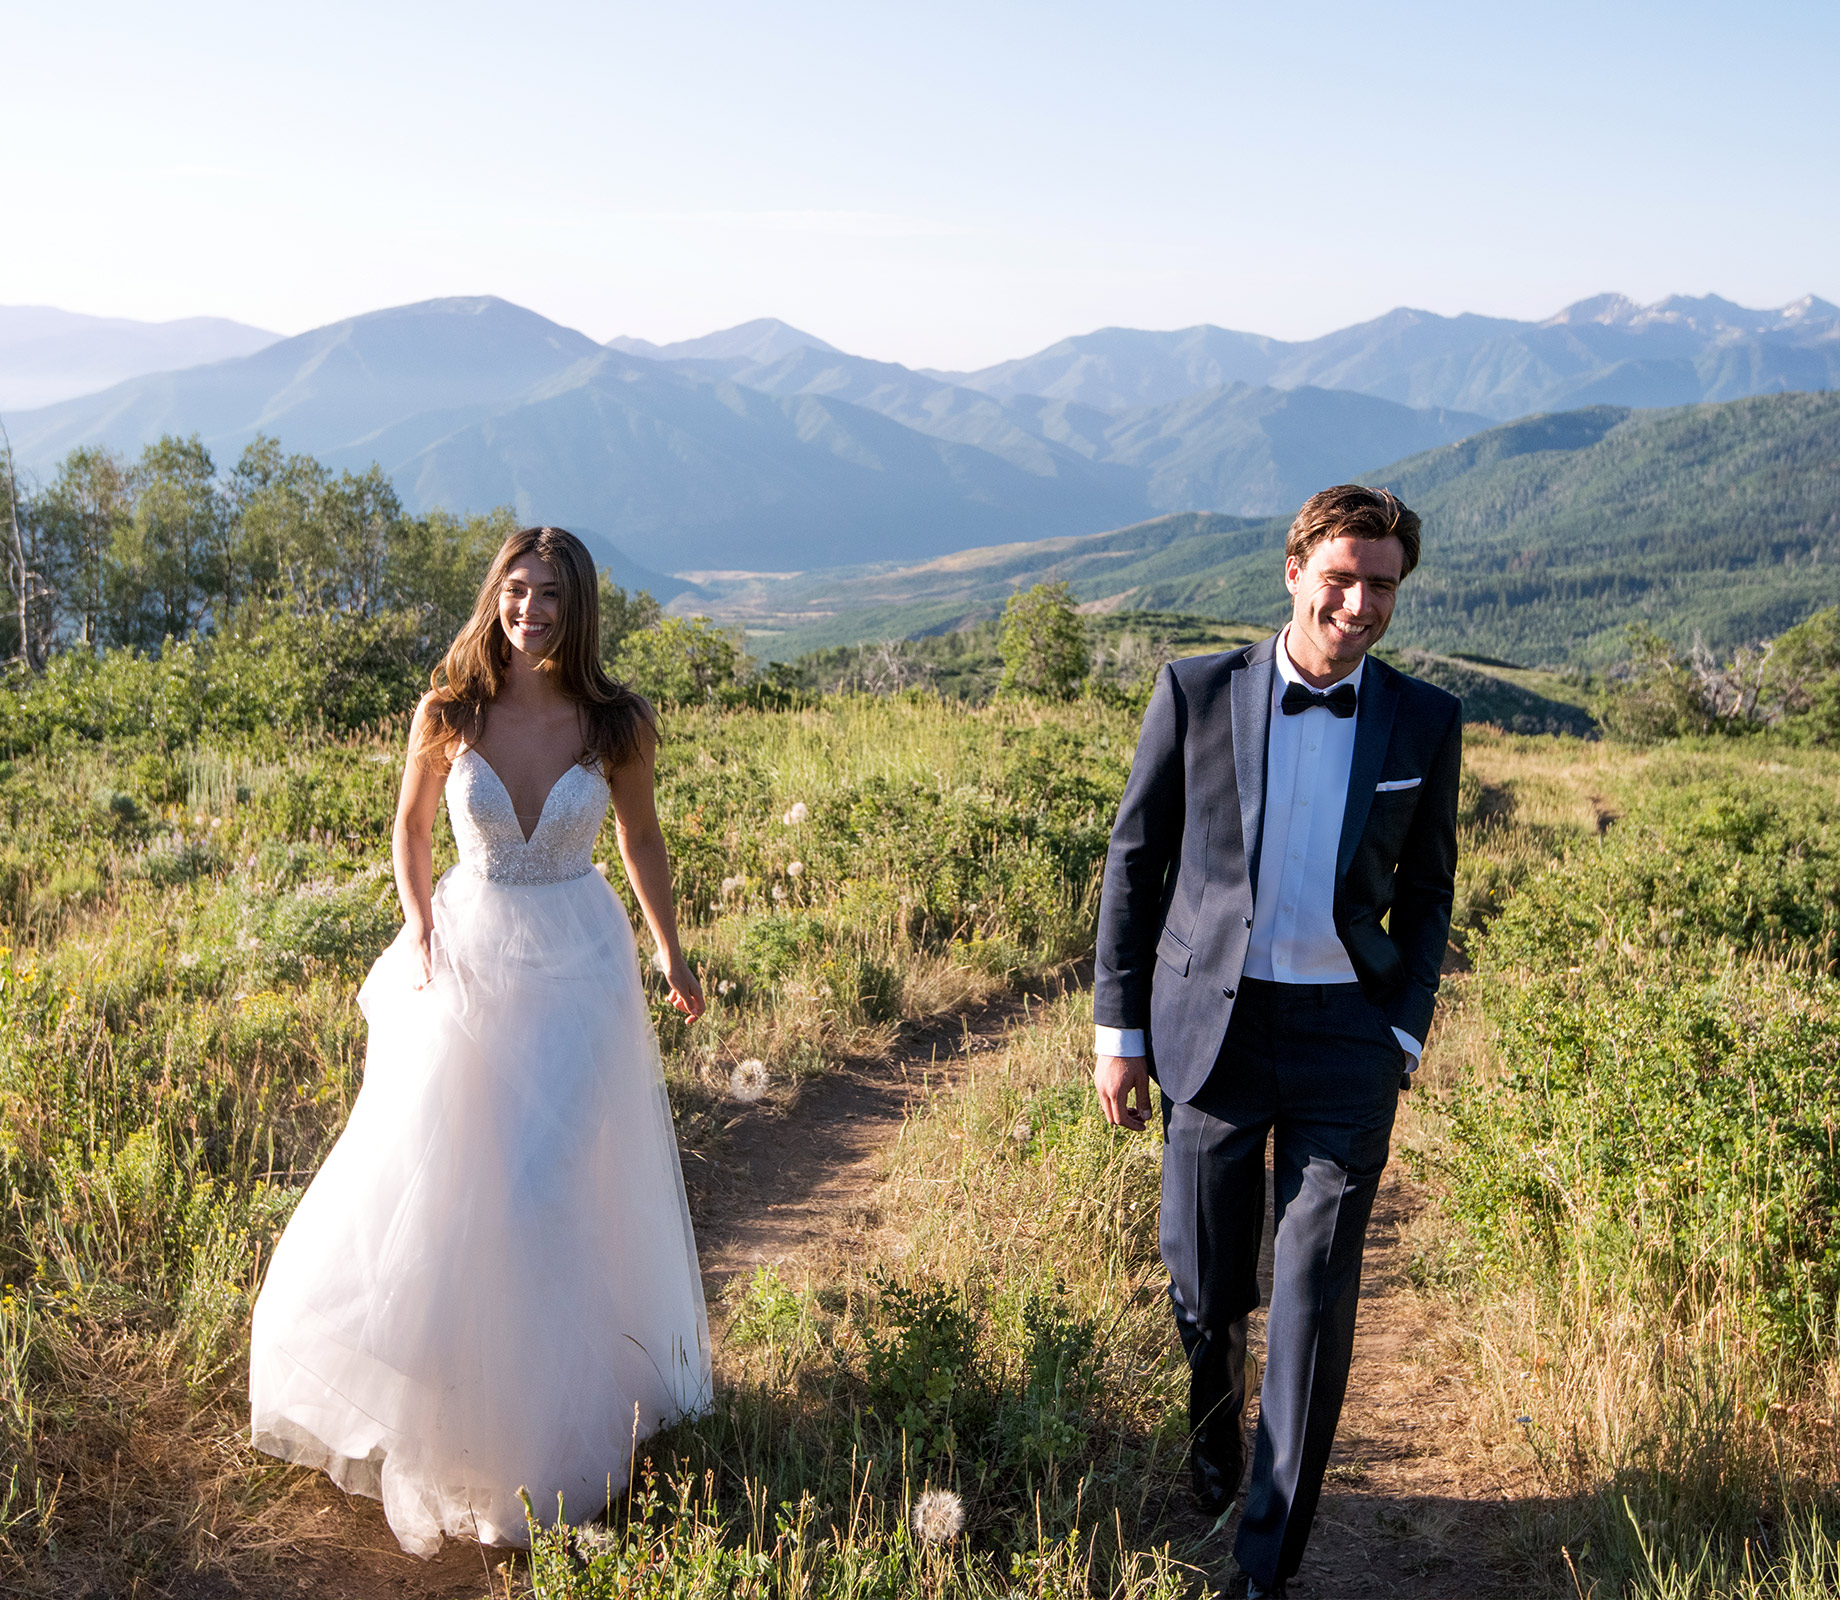 destination-wedding-dress-Martin-Thornburg-Mon-Cheri-118273_D